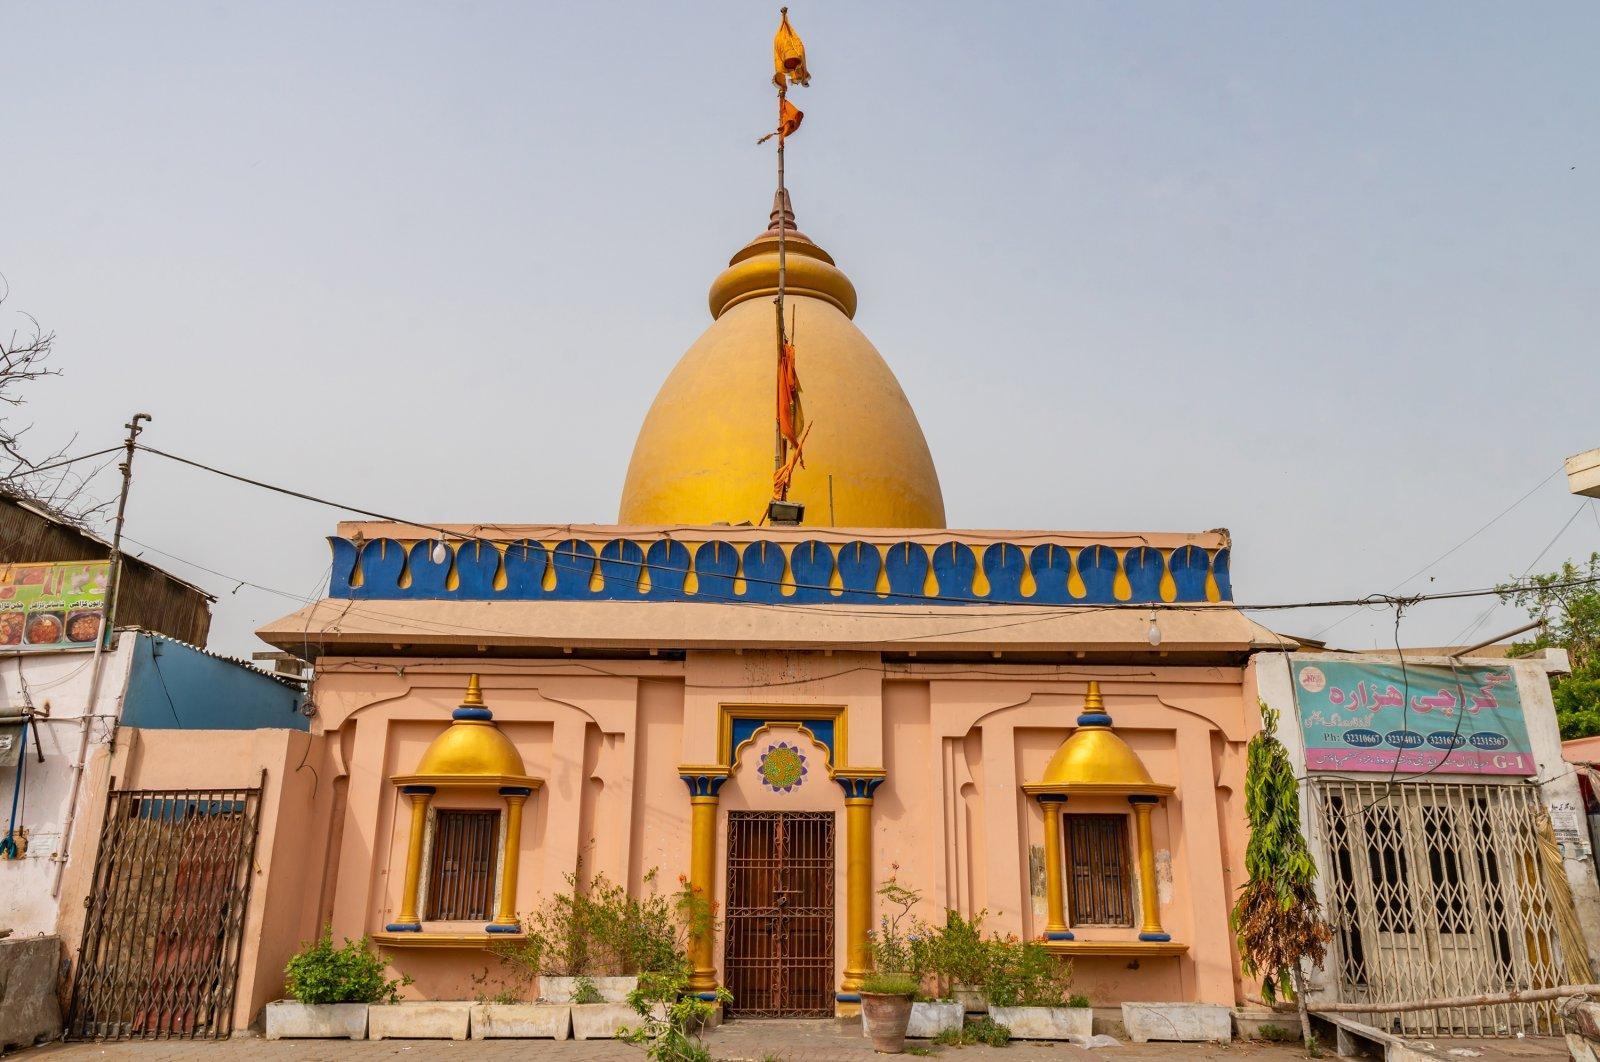 A general view of a Daryalal Mandir Hindu Temple in Karachi, Pakistan, June 2019.